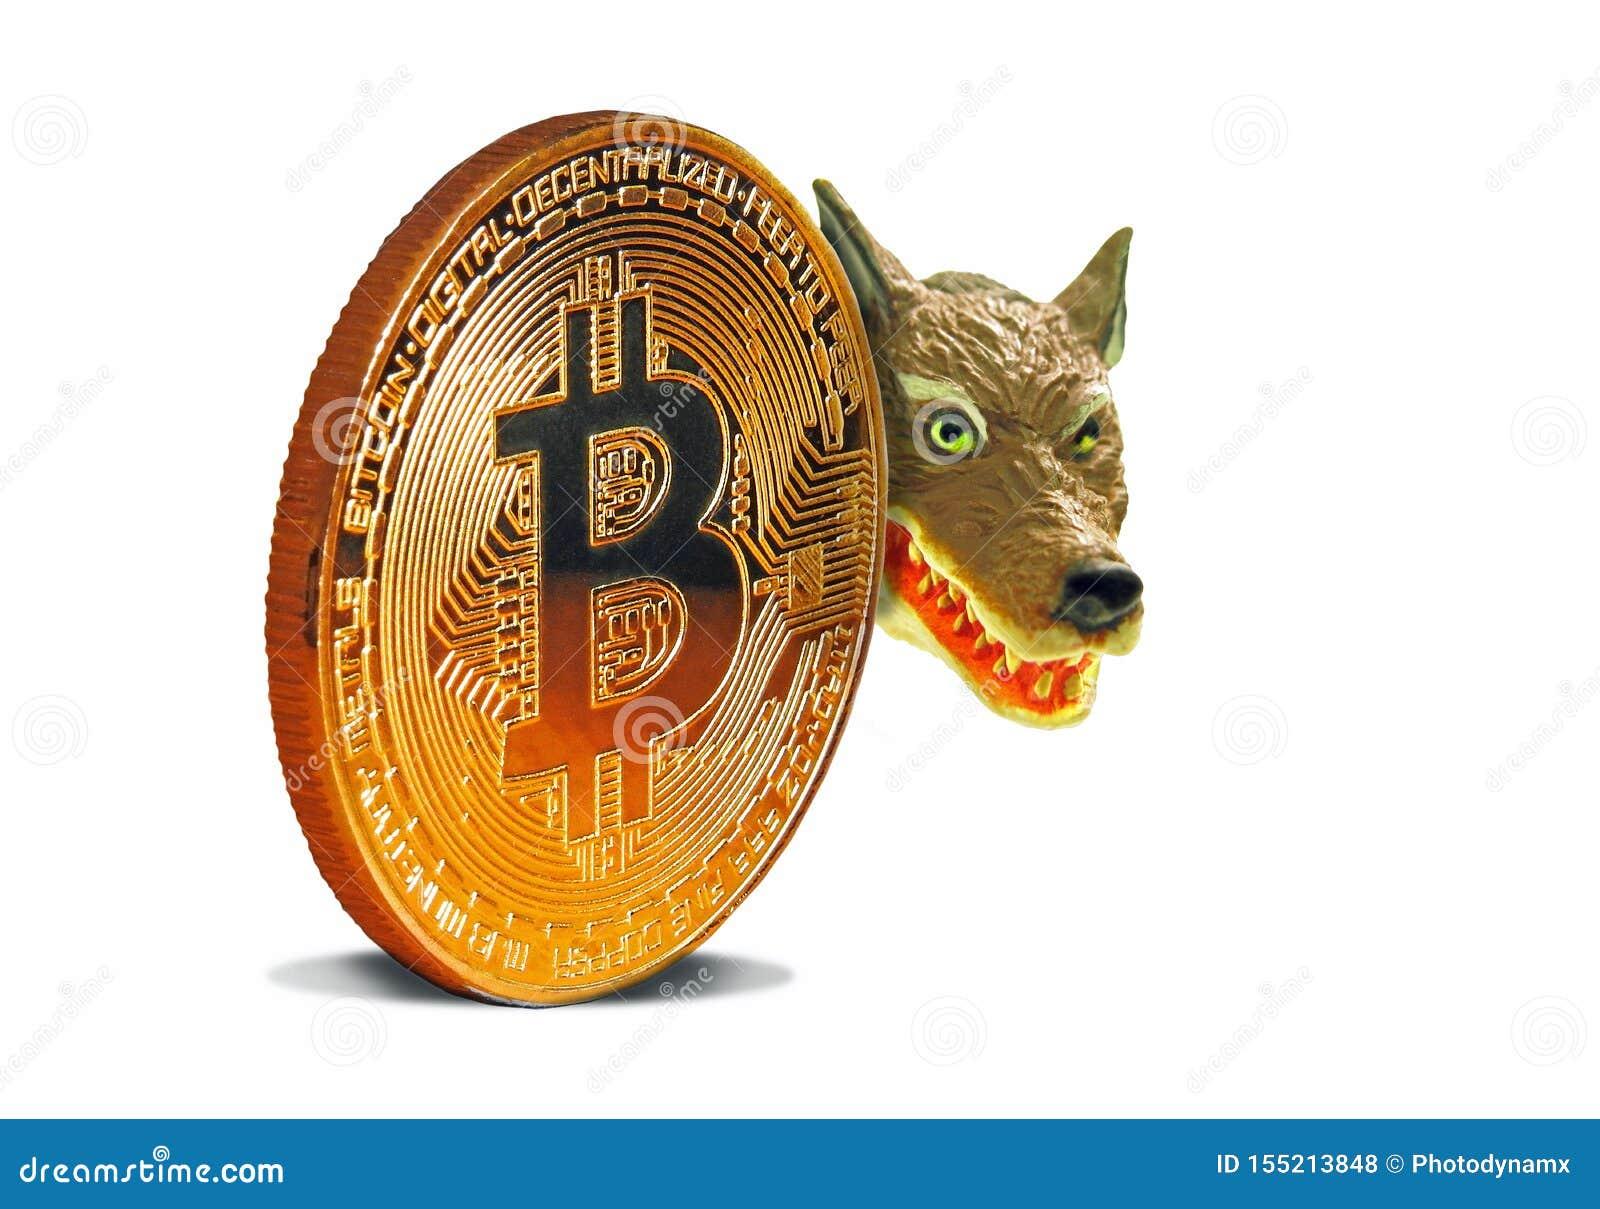 apakah commercio bitcoin haram